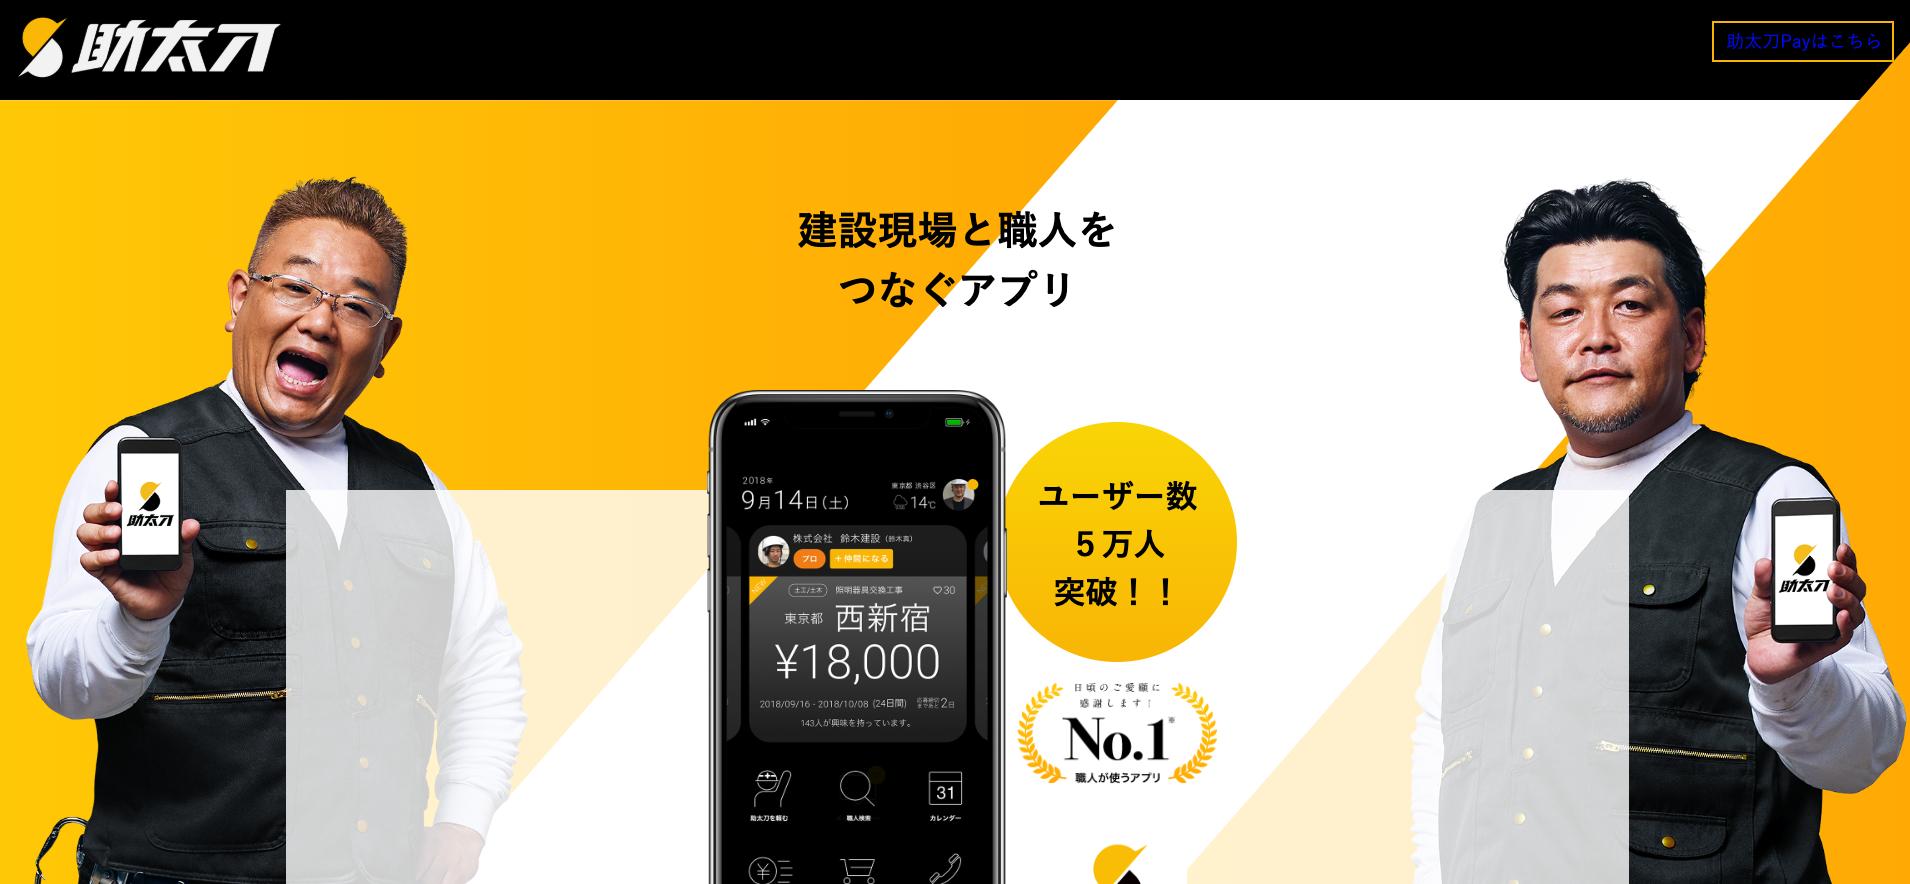 2019-04-23 9.34.55